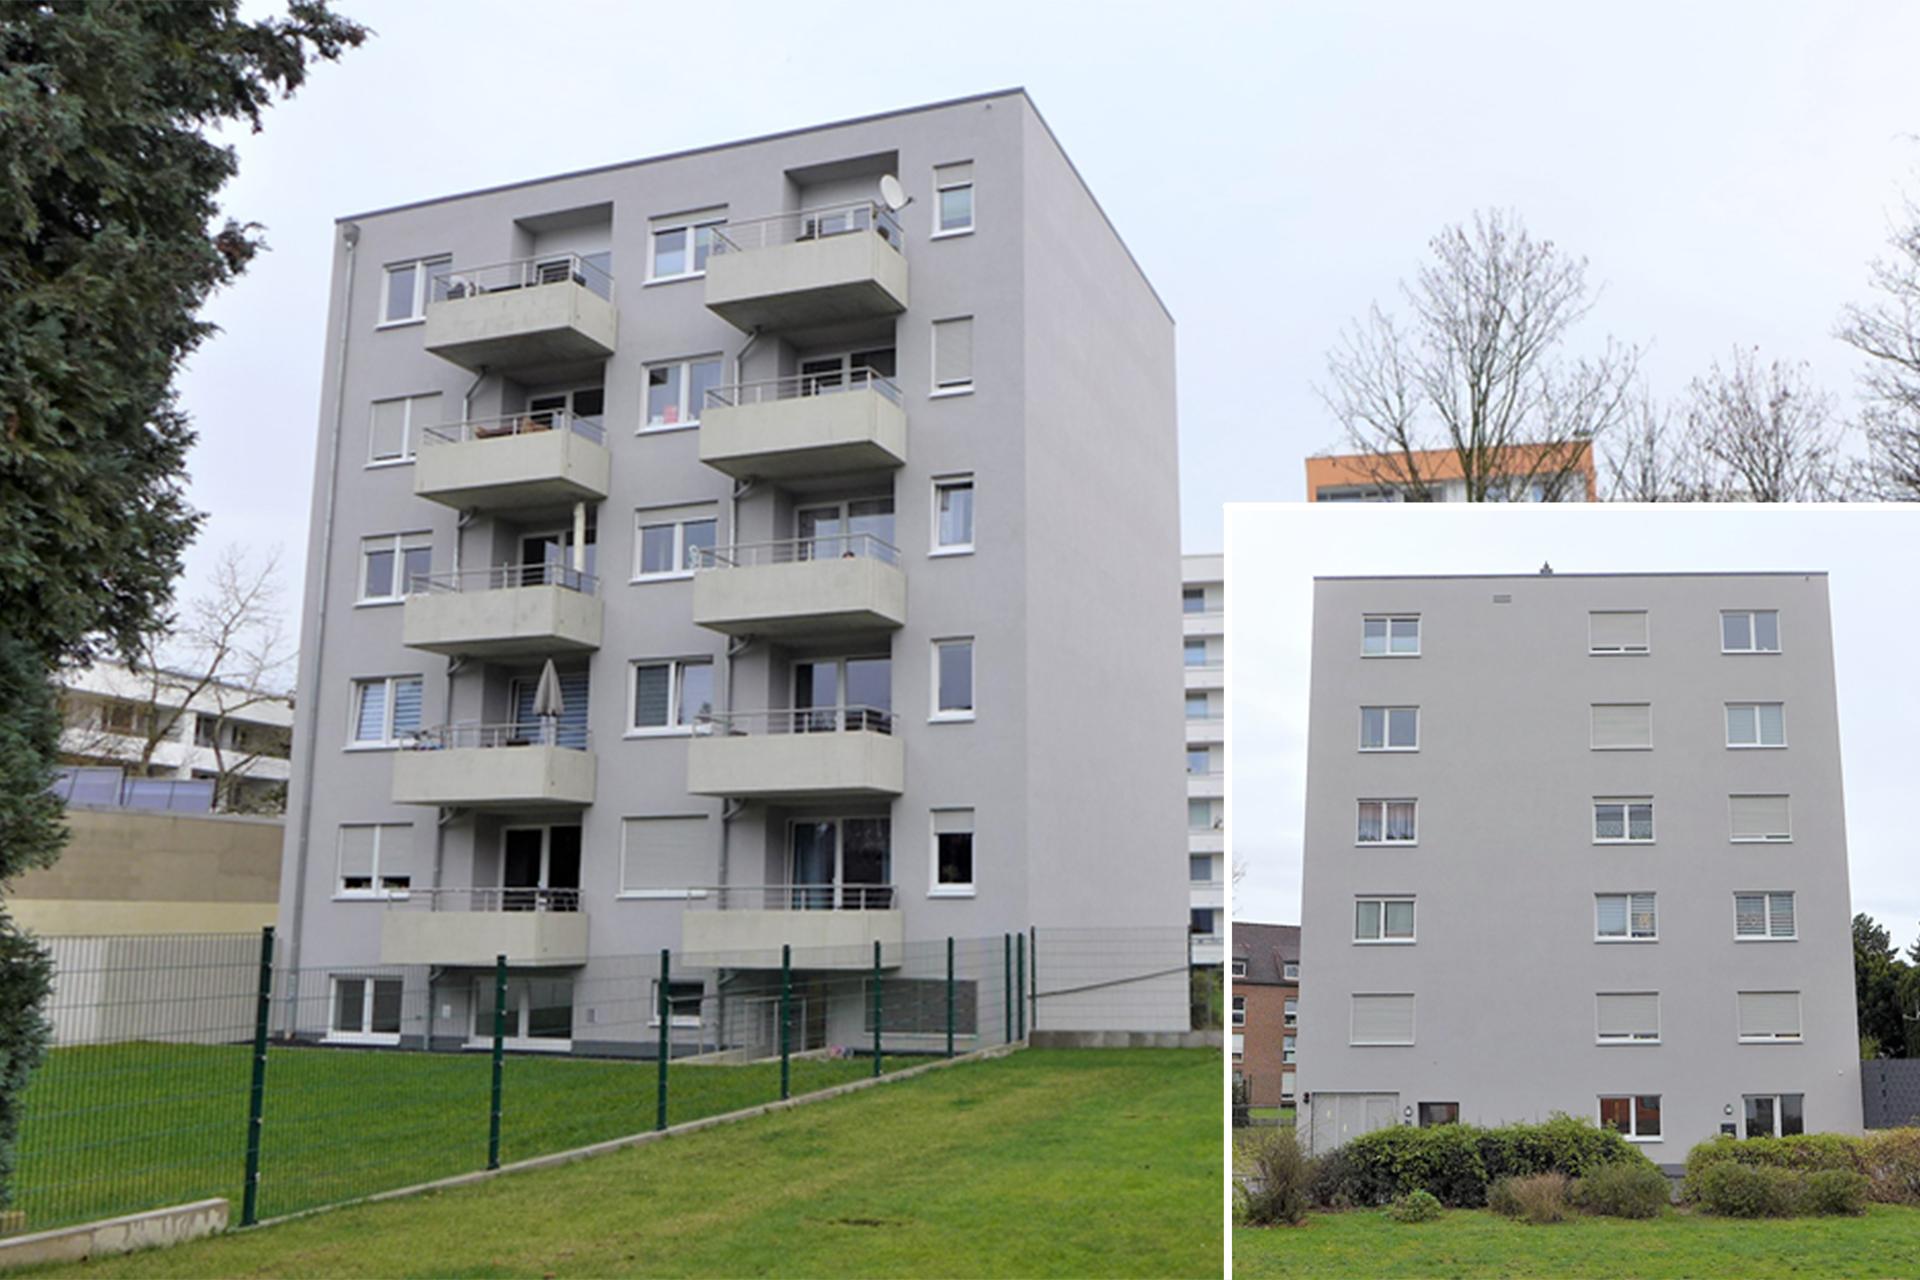 Alleestraße | Mönchengladbach